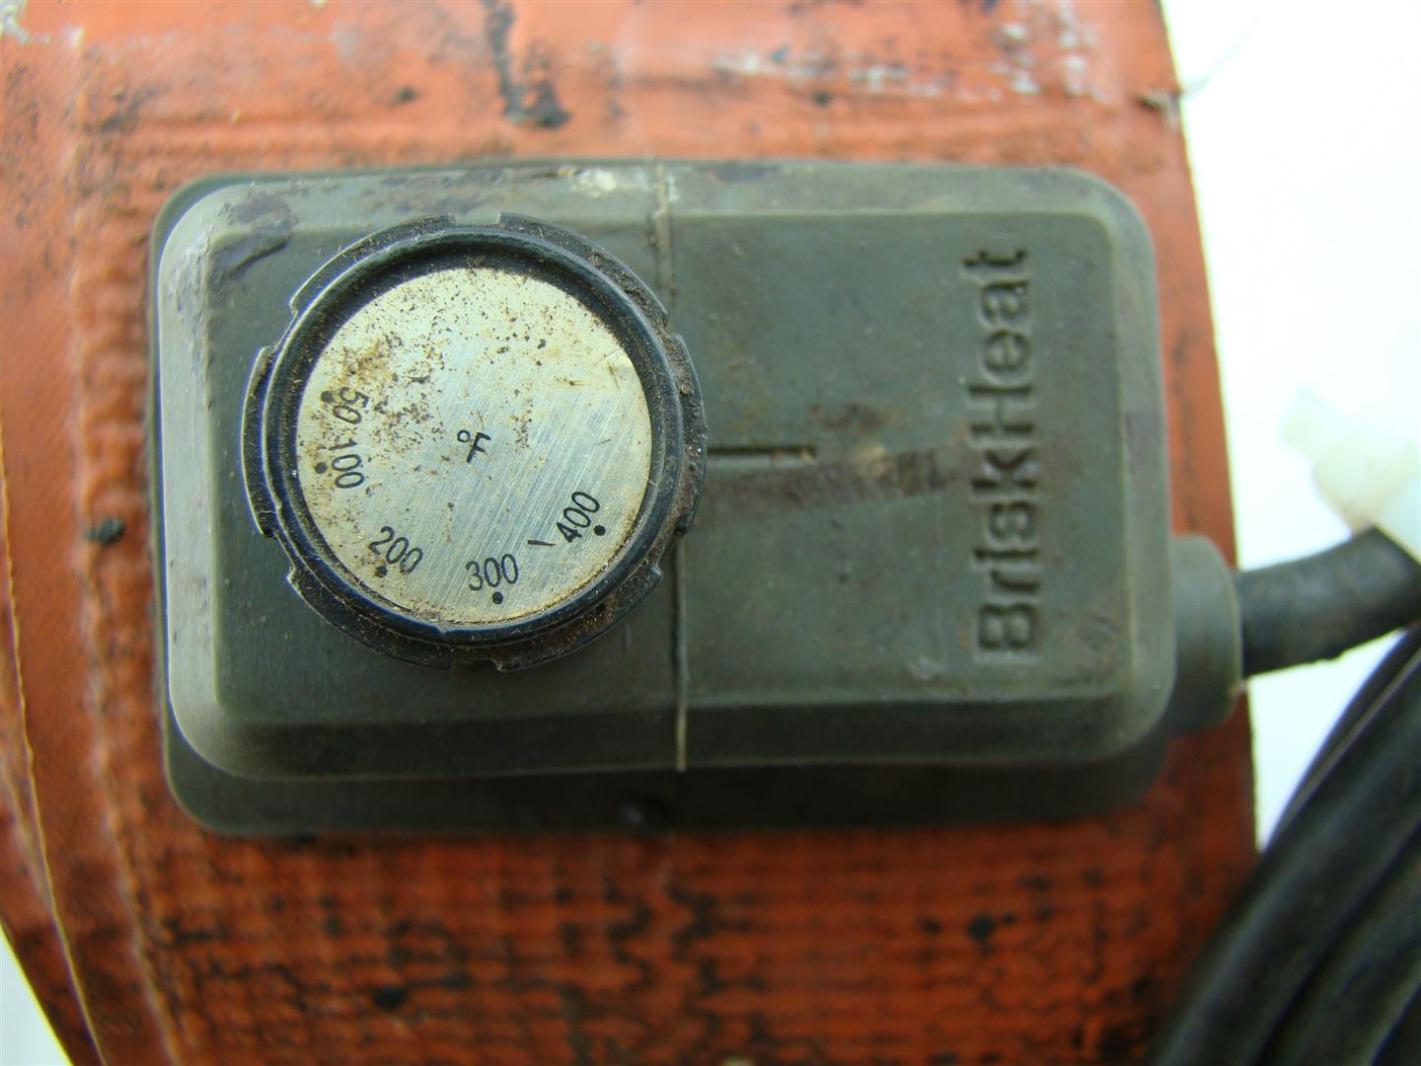 Briskheat Drum Heater 120v Joseph Fazzio Incorporated